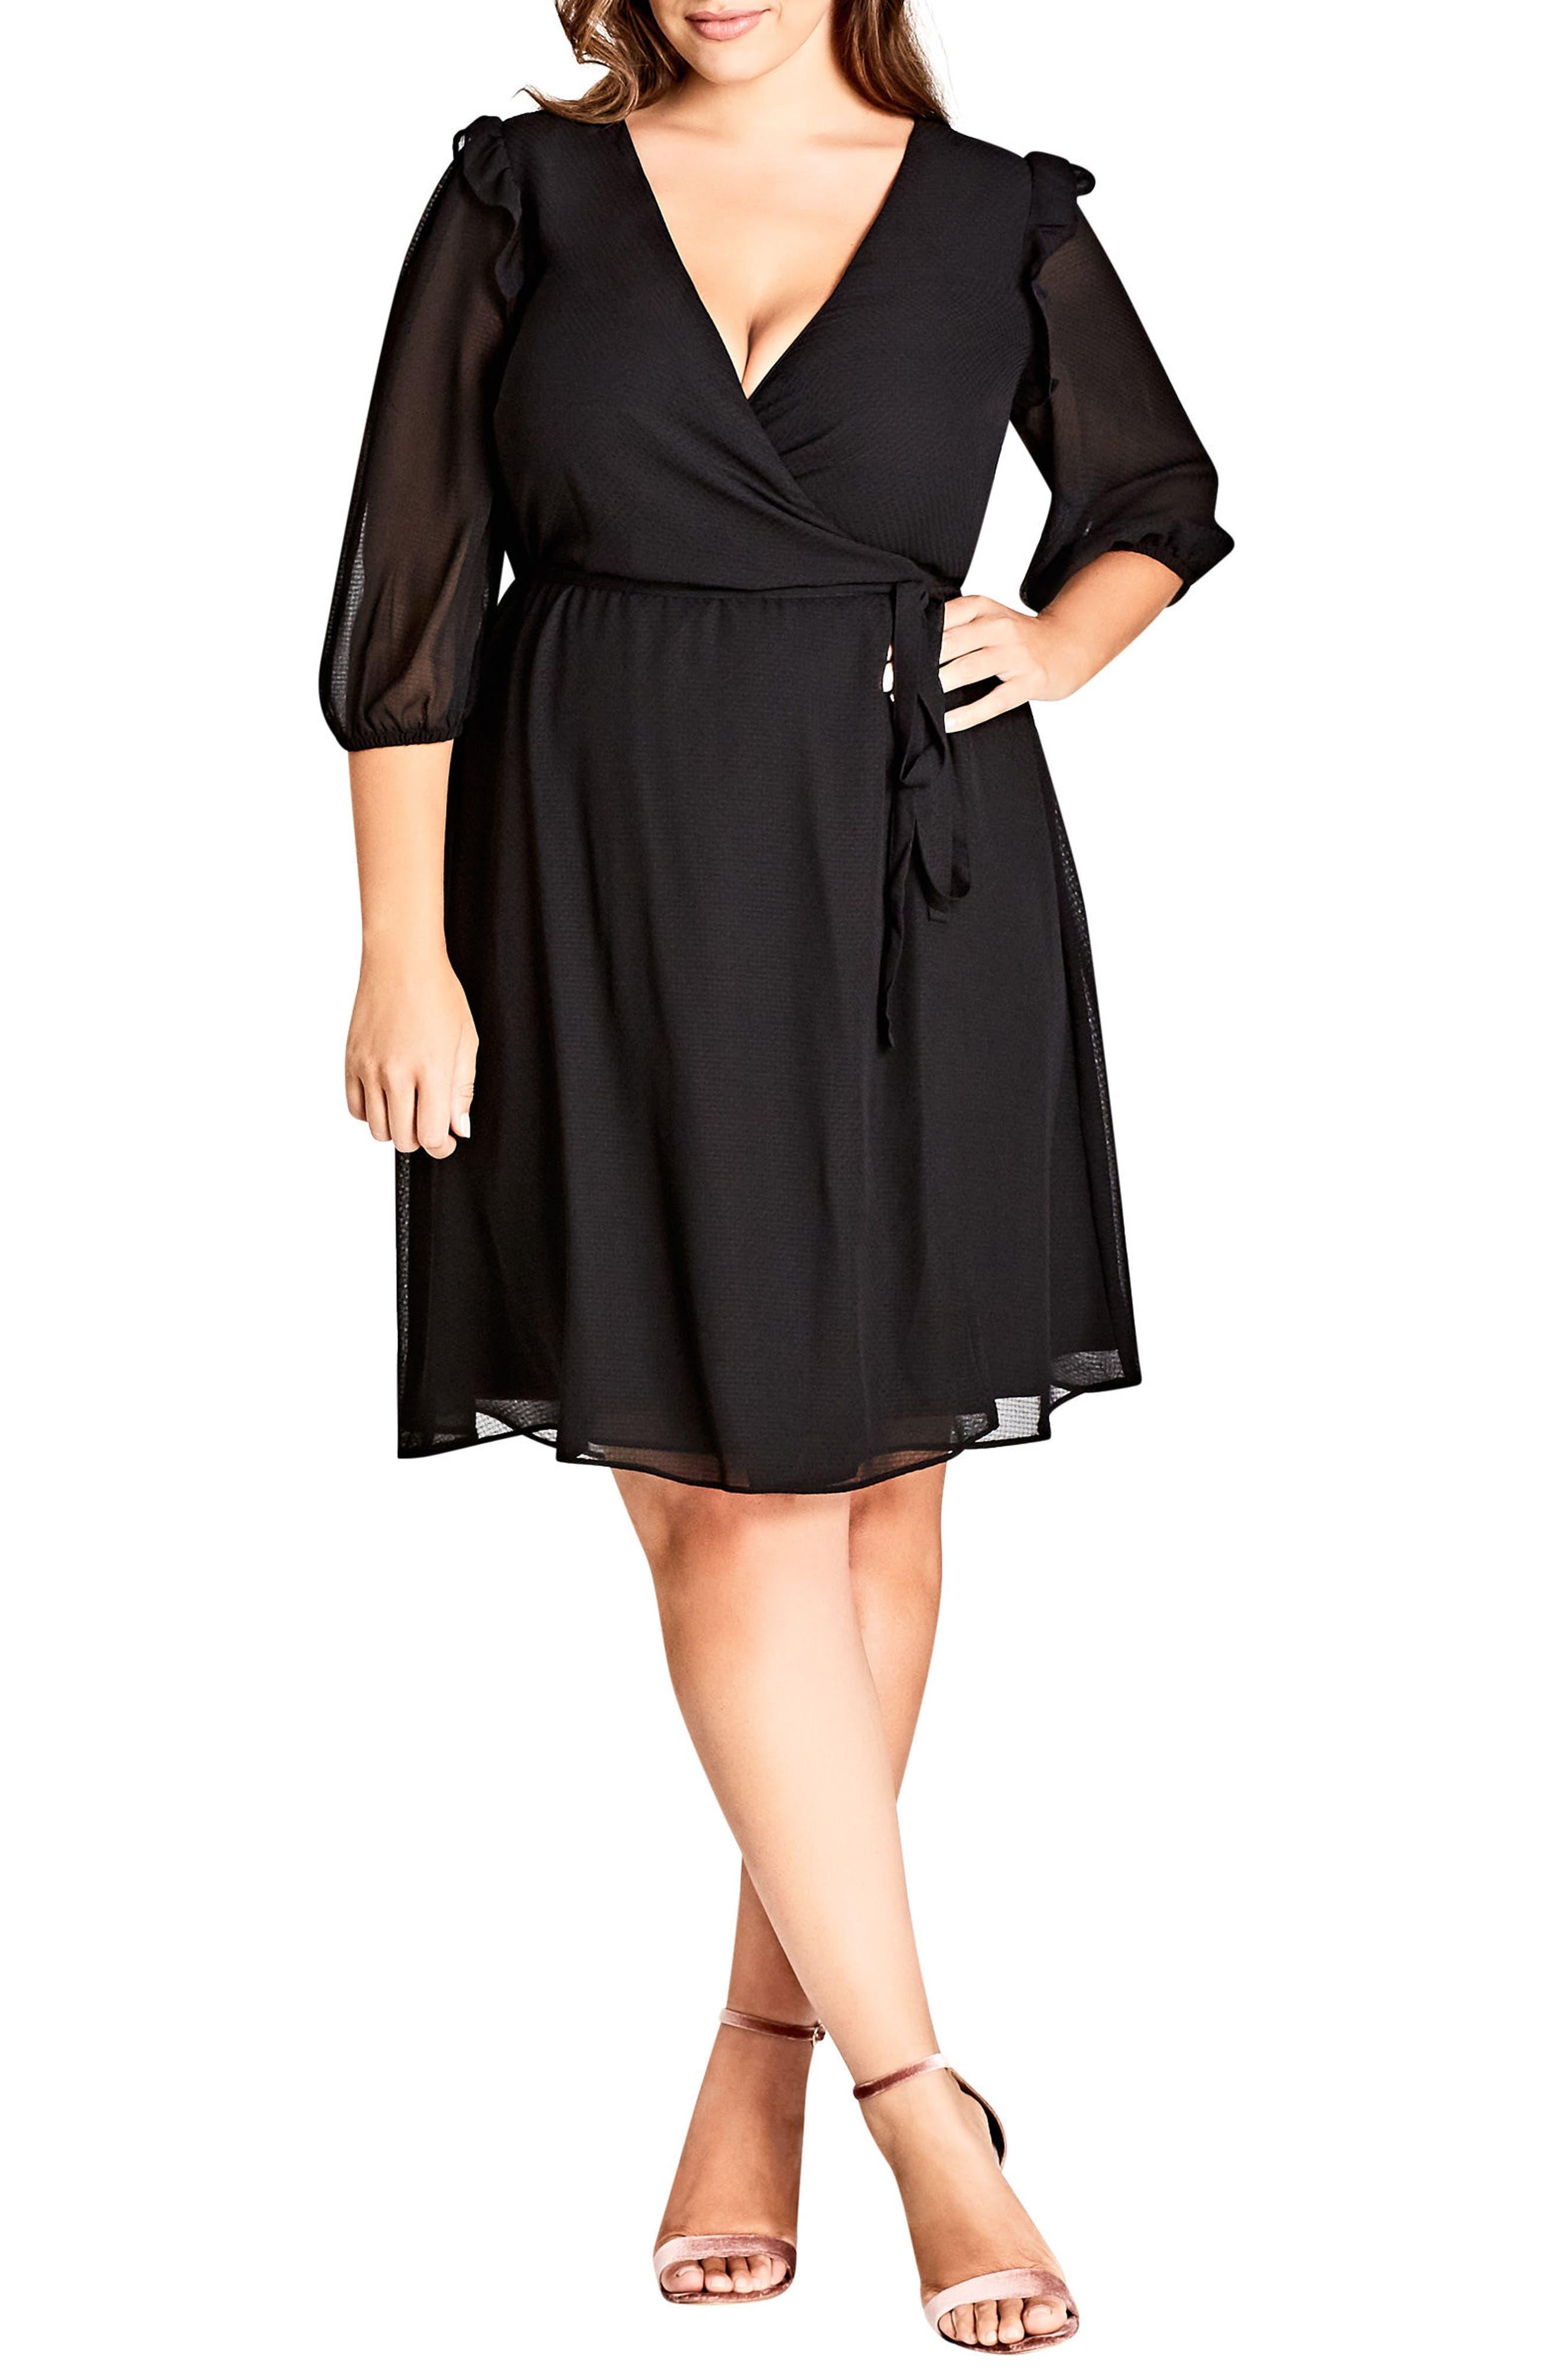 Simply So Wrap Dress,                             Main thumbnail 1, color,                             Black